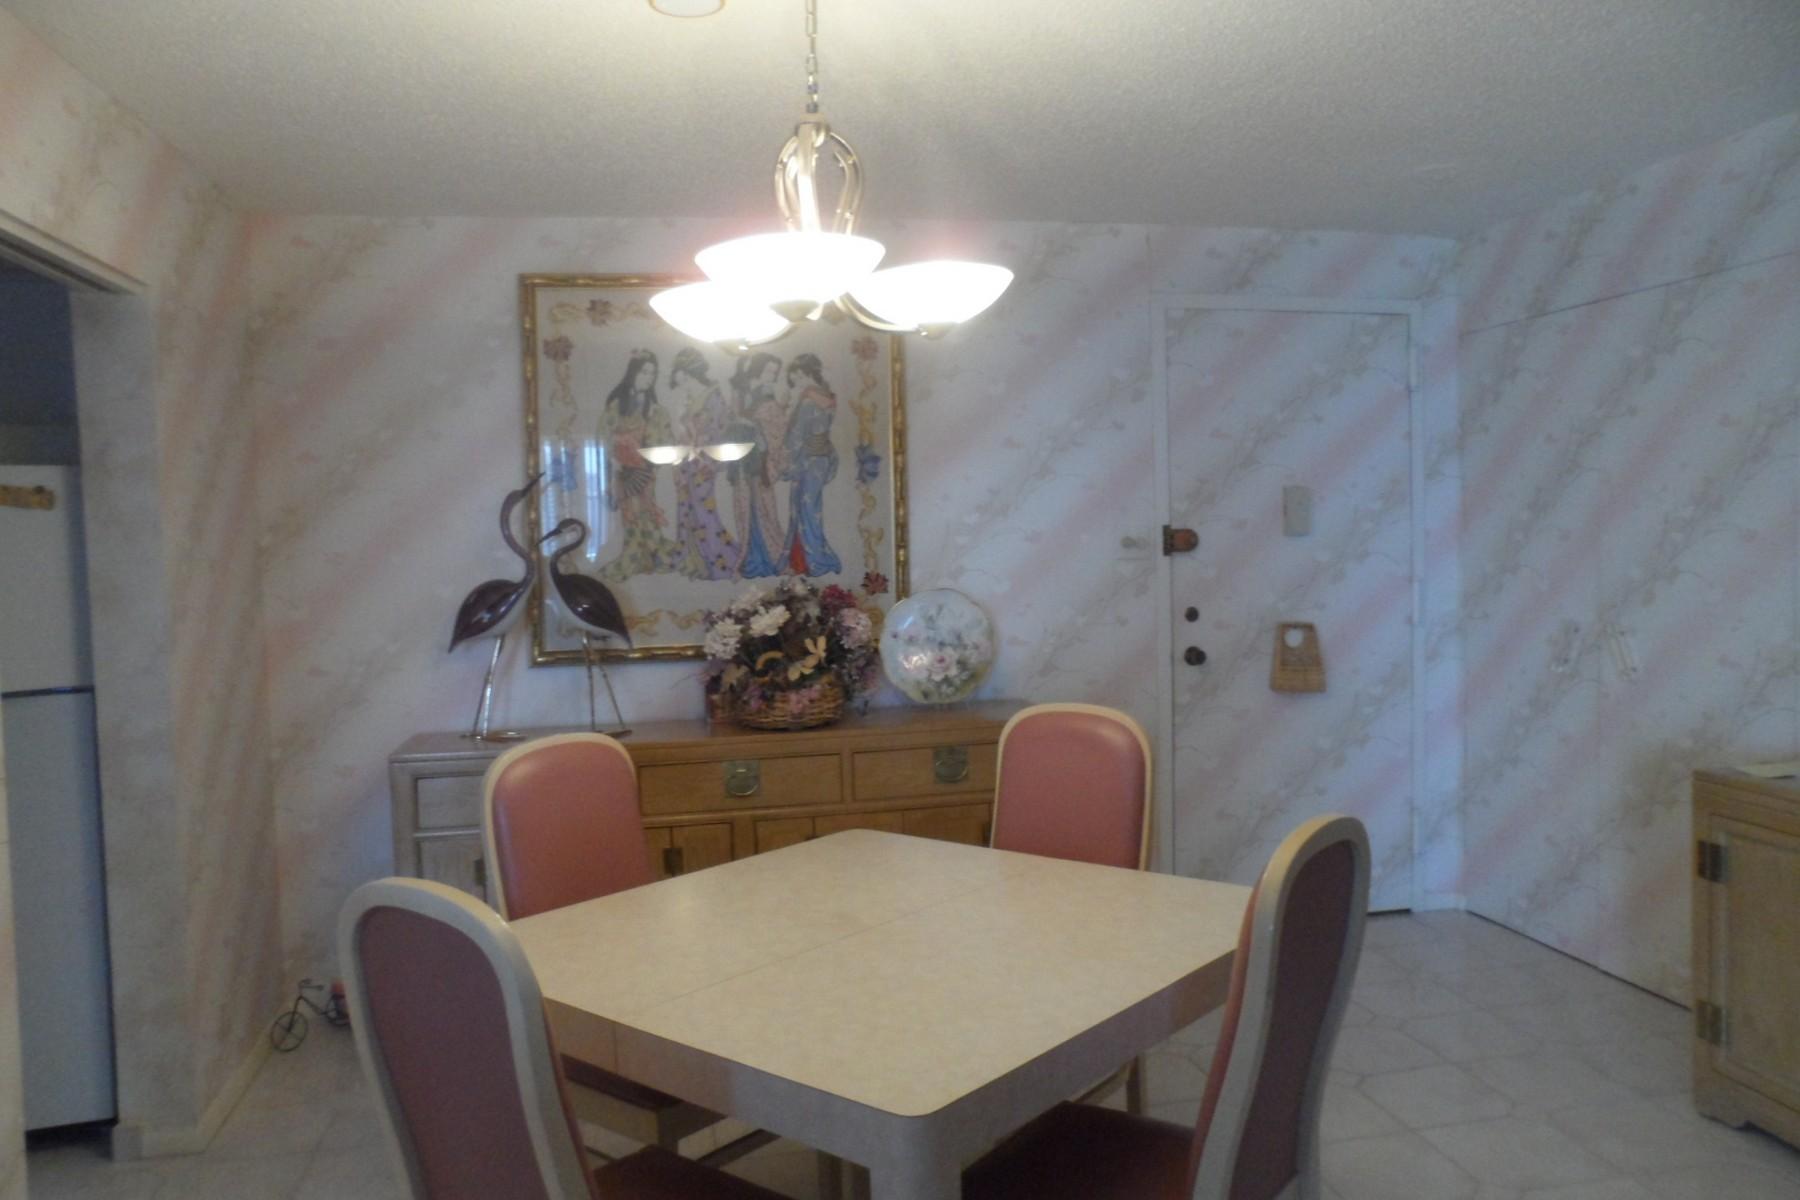 Property For Sale at 100 S Berkley Unit 16H